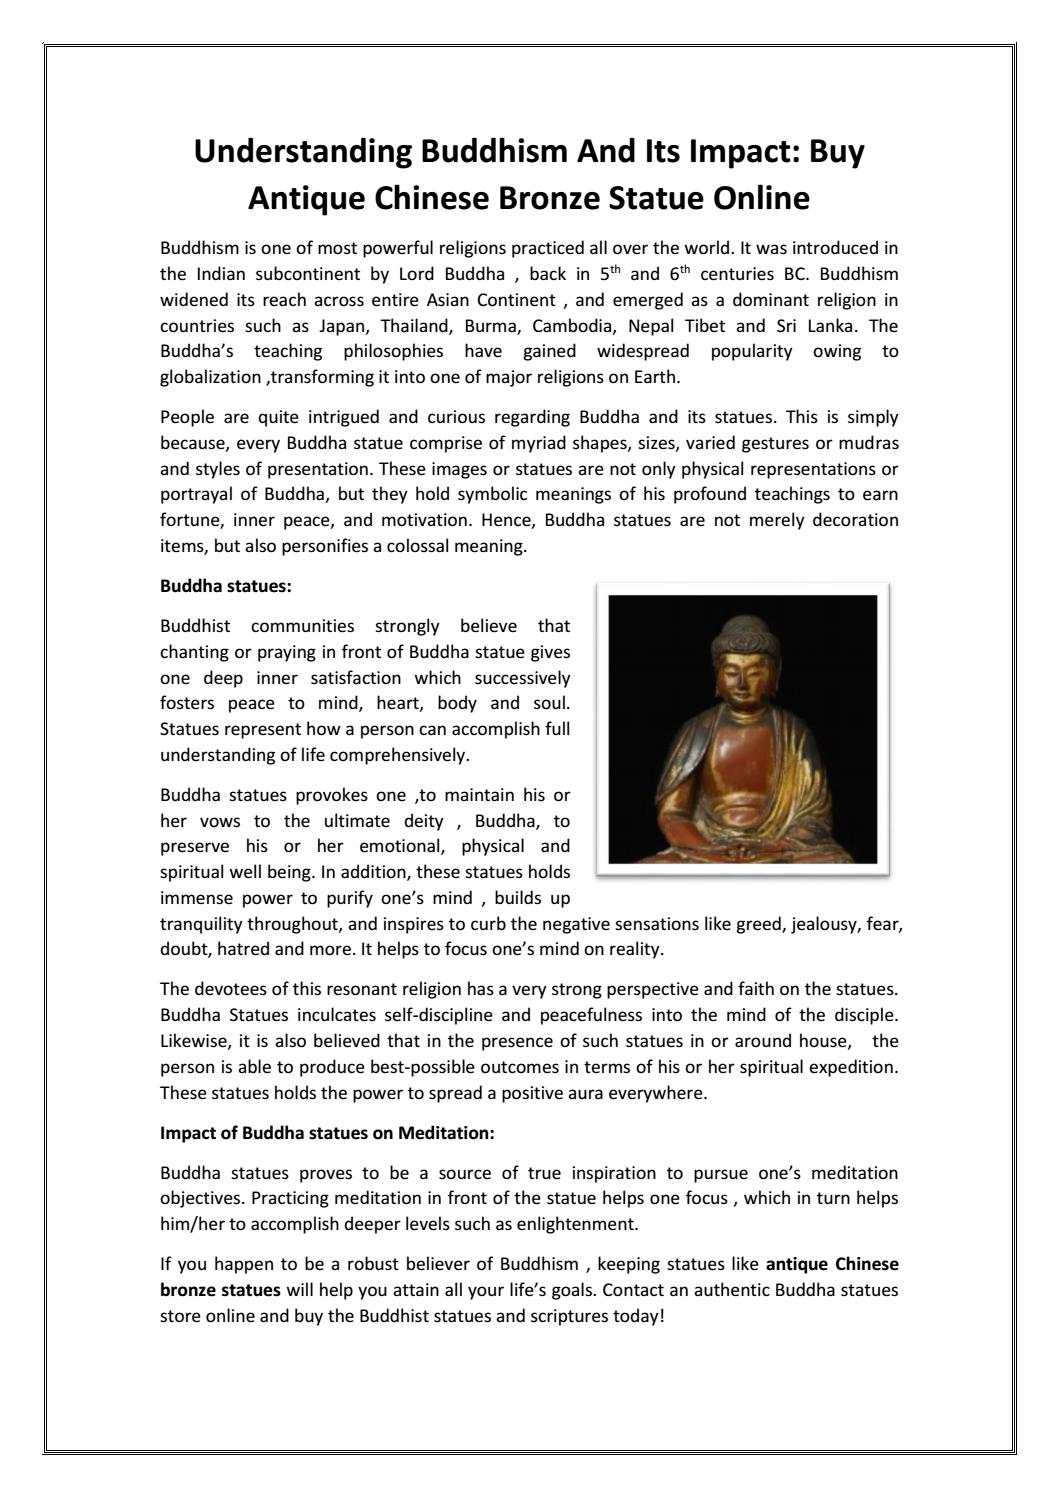 Understanding buddhism and its impact buy antique chinese bronze understanding buddhism and its impact buy antique chinese bronze statue online by miaasmith issuu buycottarizona